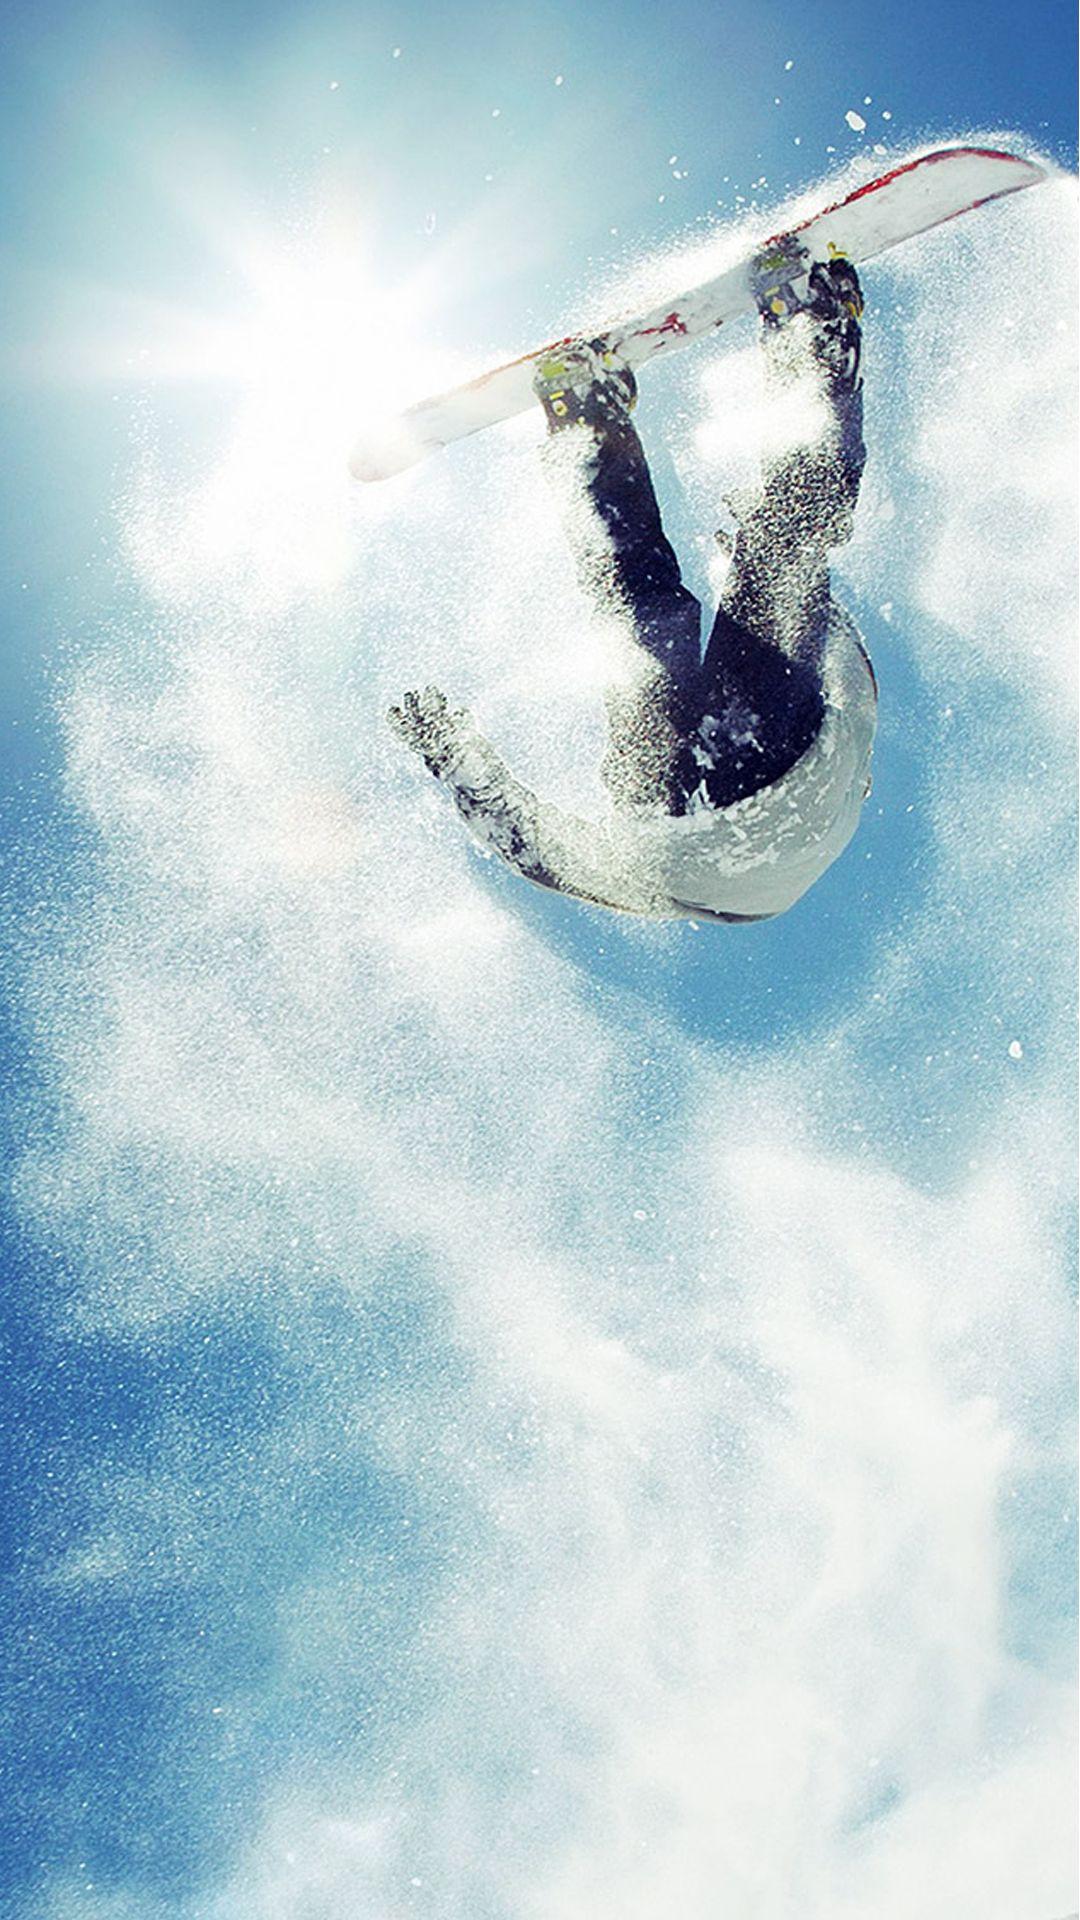 Snowboard Big Air Powder Iphone 6 Wallpaper Download Iphone Wallpapers Ipad Wallpapers One Stop Download Sports Wallpapers Snowboard Snowboarding